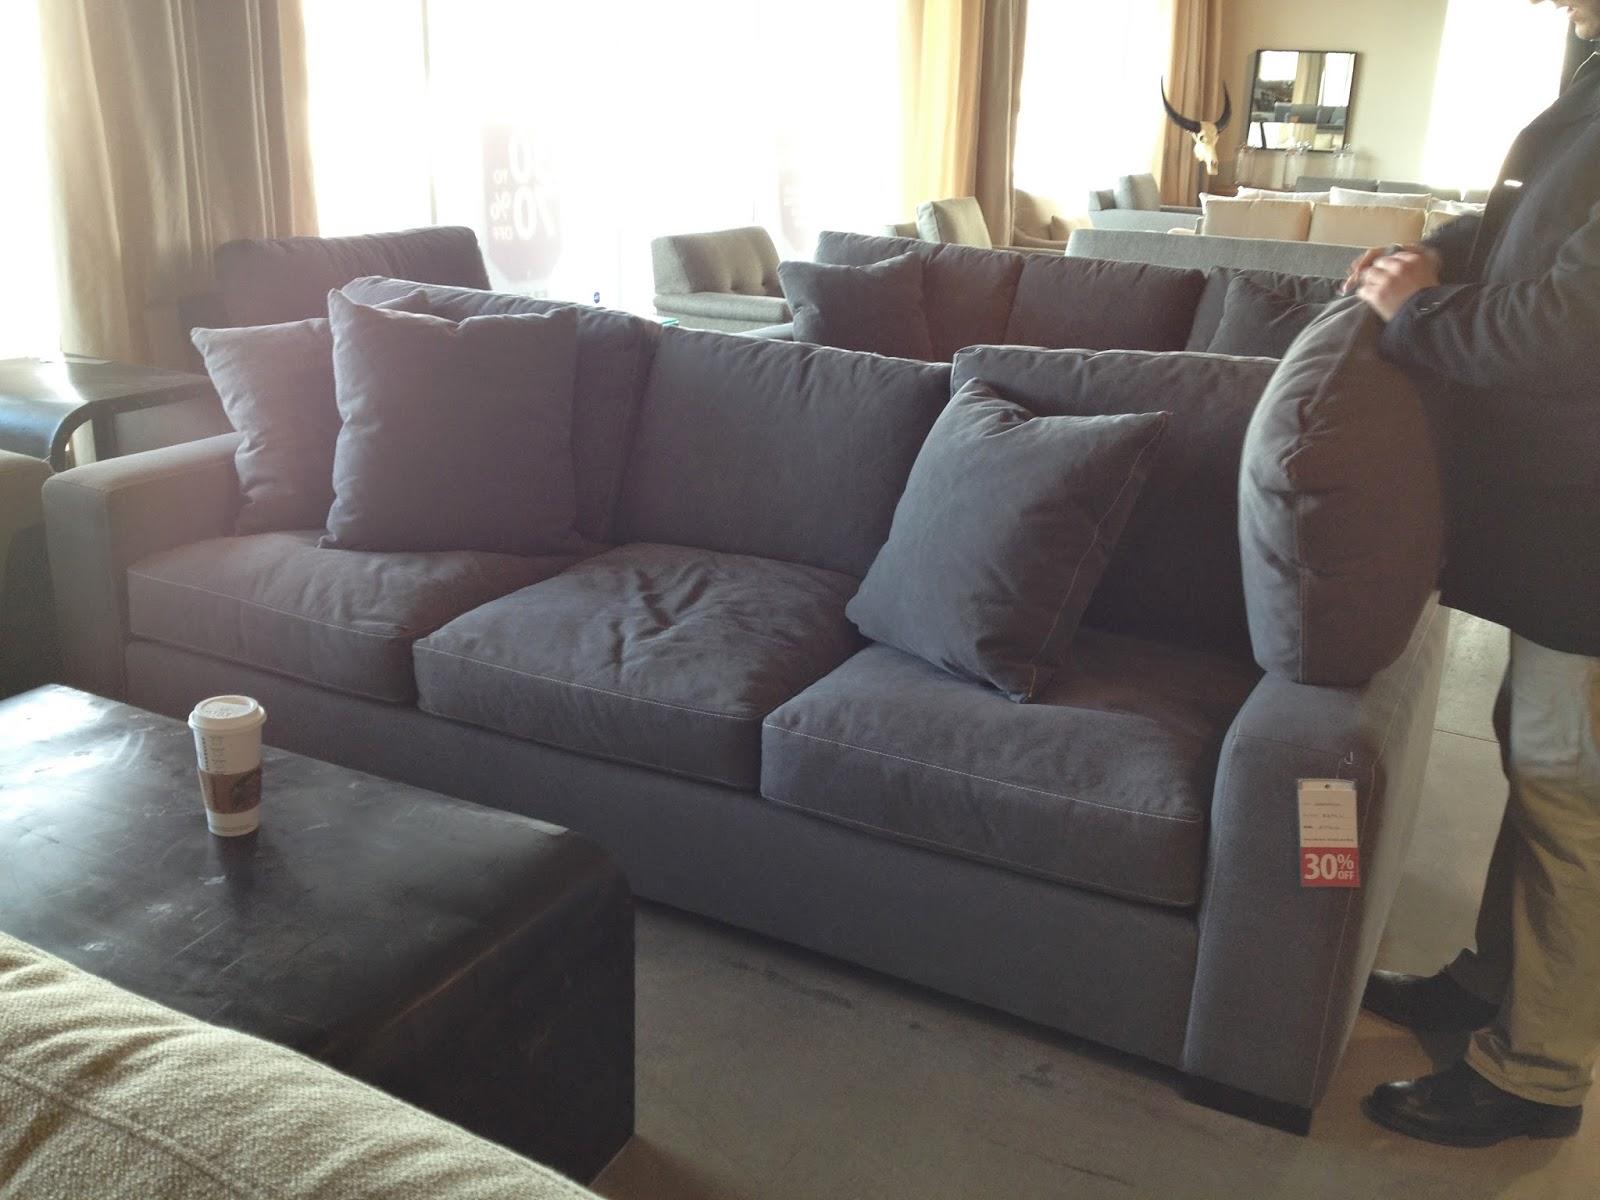 crate and barrel davis sofa slipcover muuto sofabord tilbud sectional reviews shapeyourminds